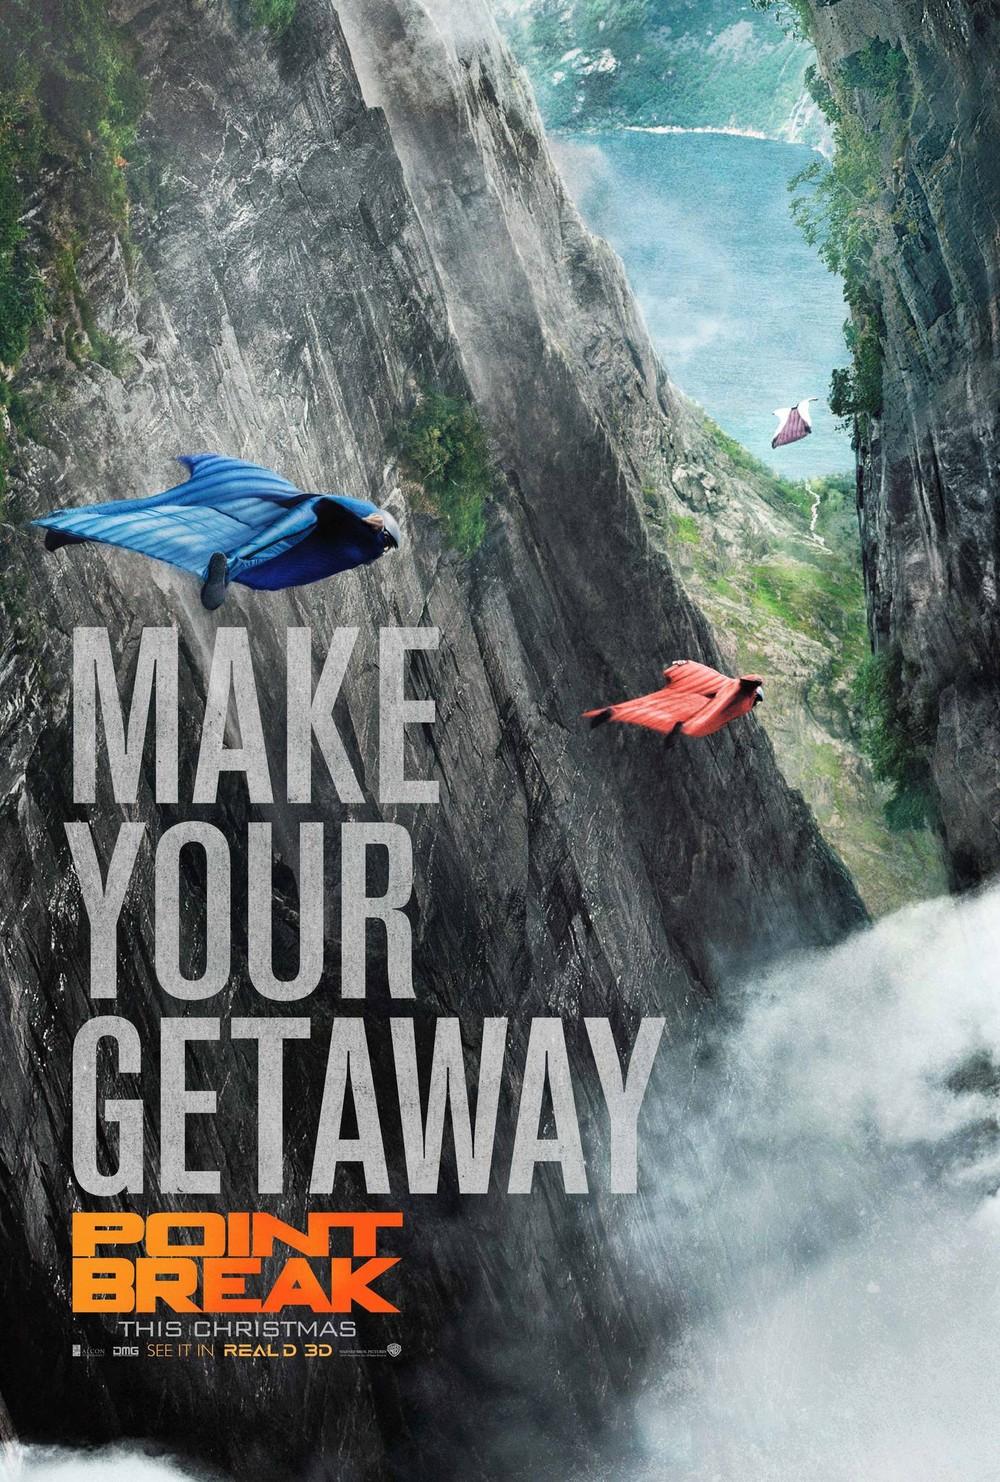 King 3d Wallpaper Point Break Dvd Release Date Redbox Netflix Itunes Amazon